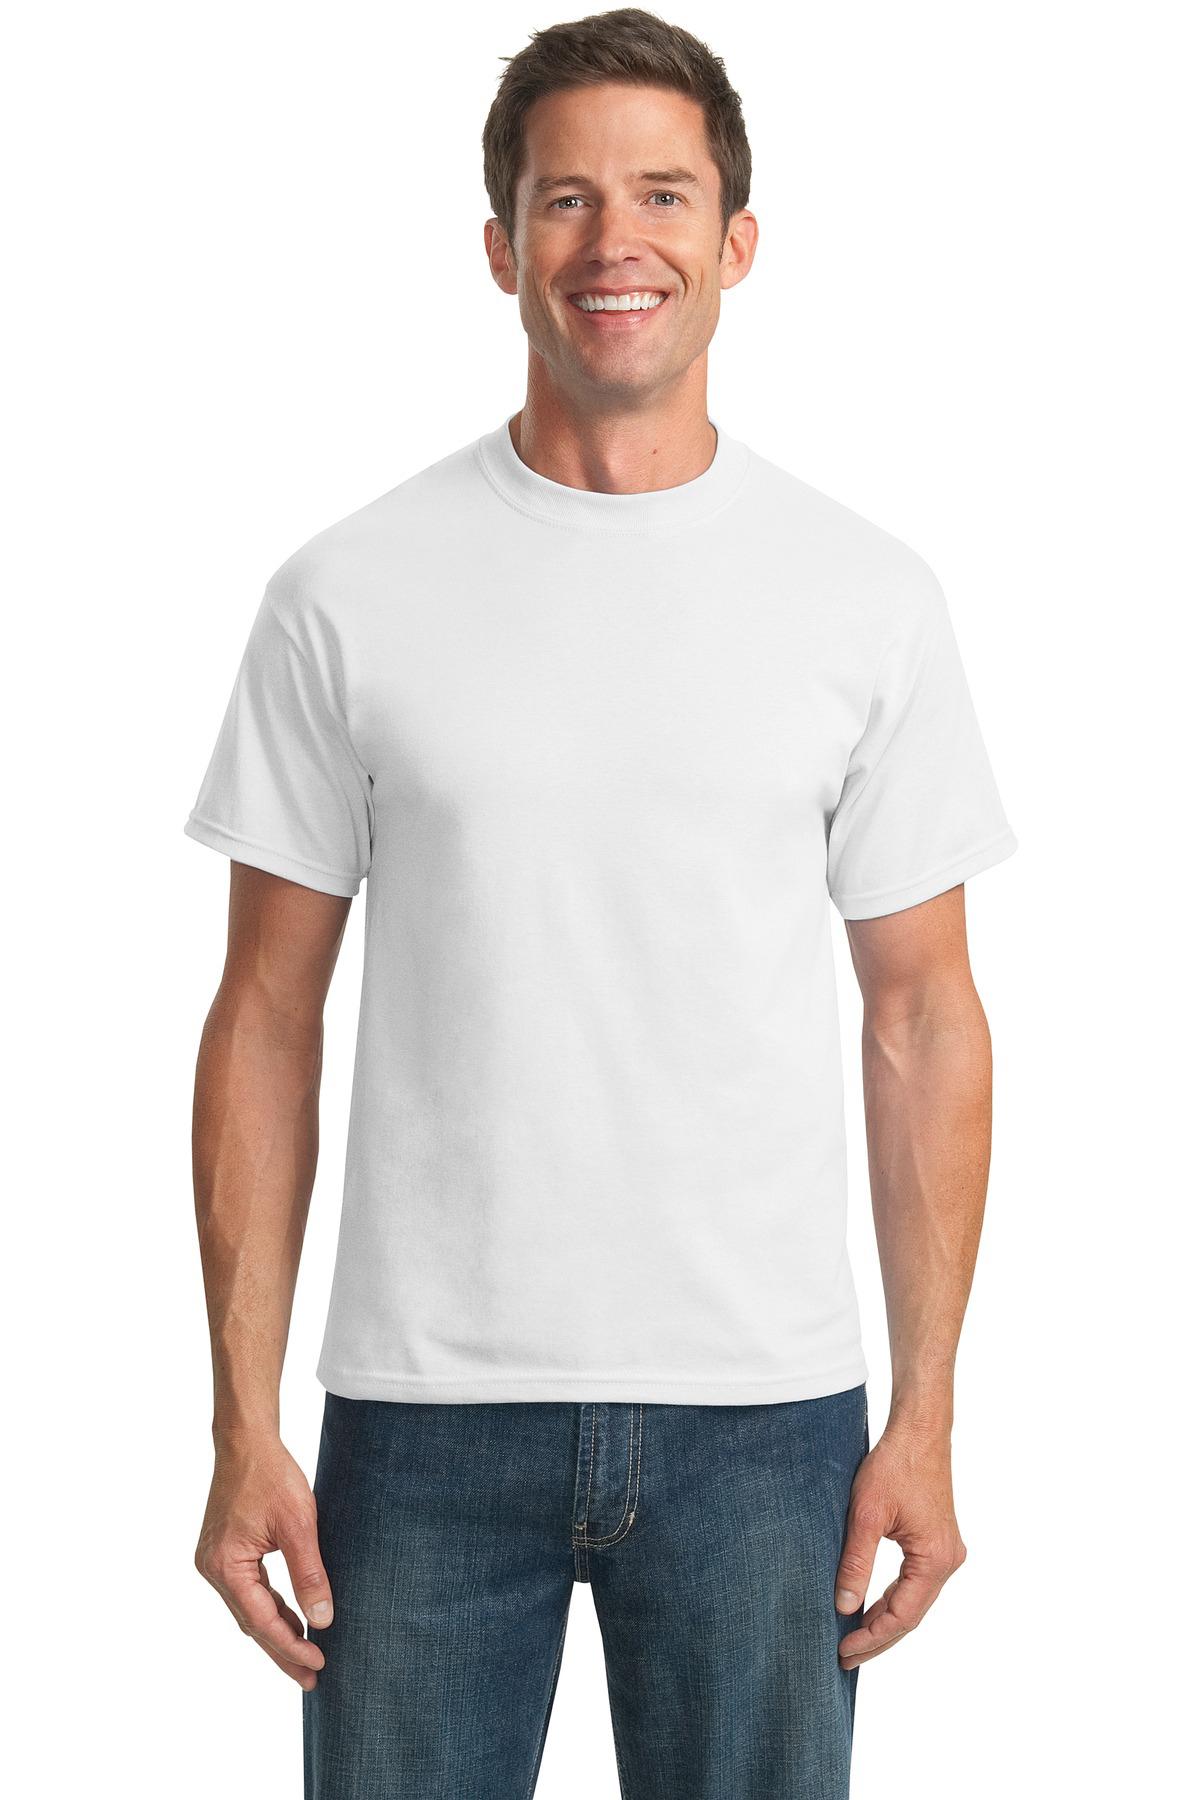 857fef94eaa5 Port & Company® Tall Core Blend Tee | 50/50 Blend | T-Shirts | Port &  Company